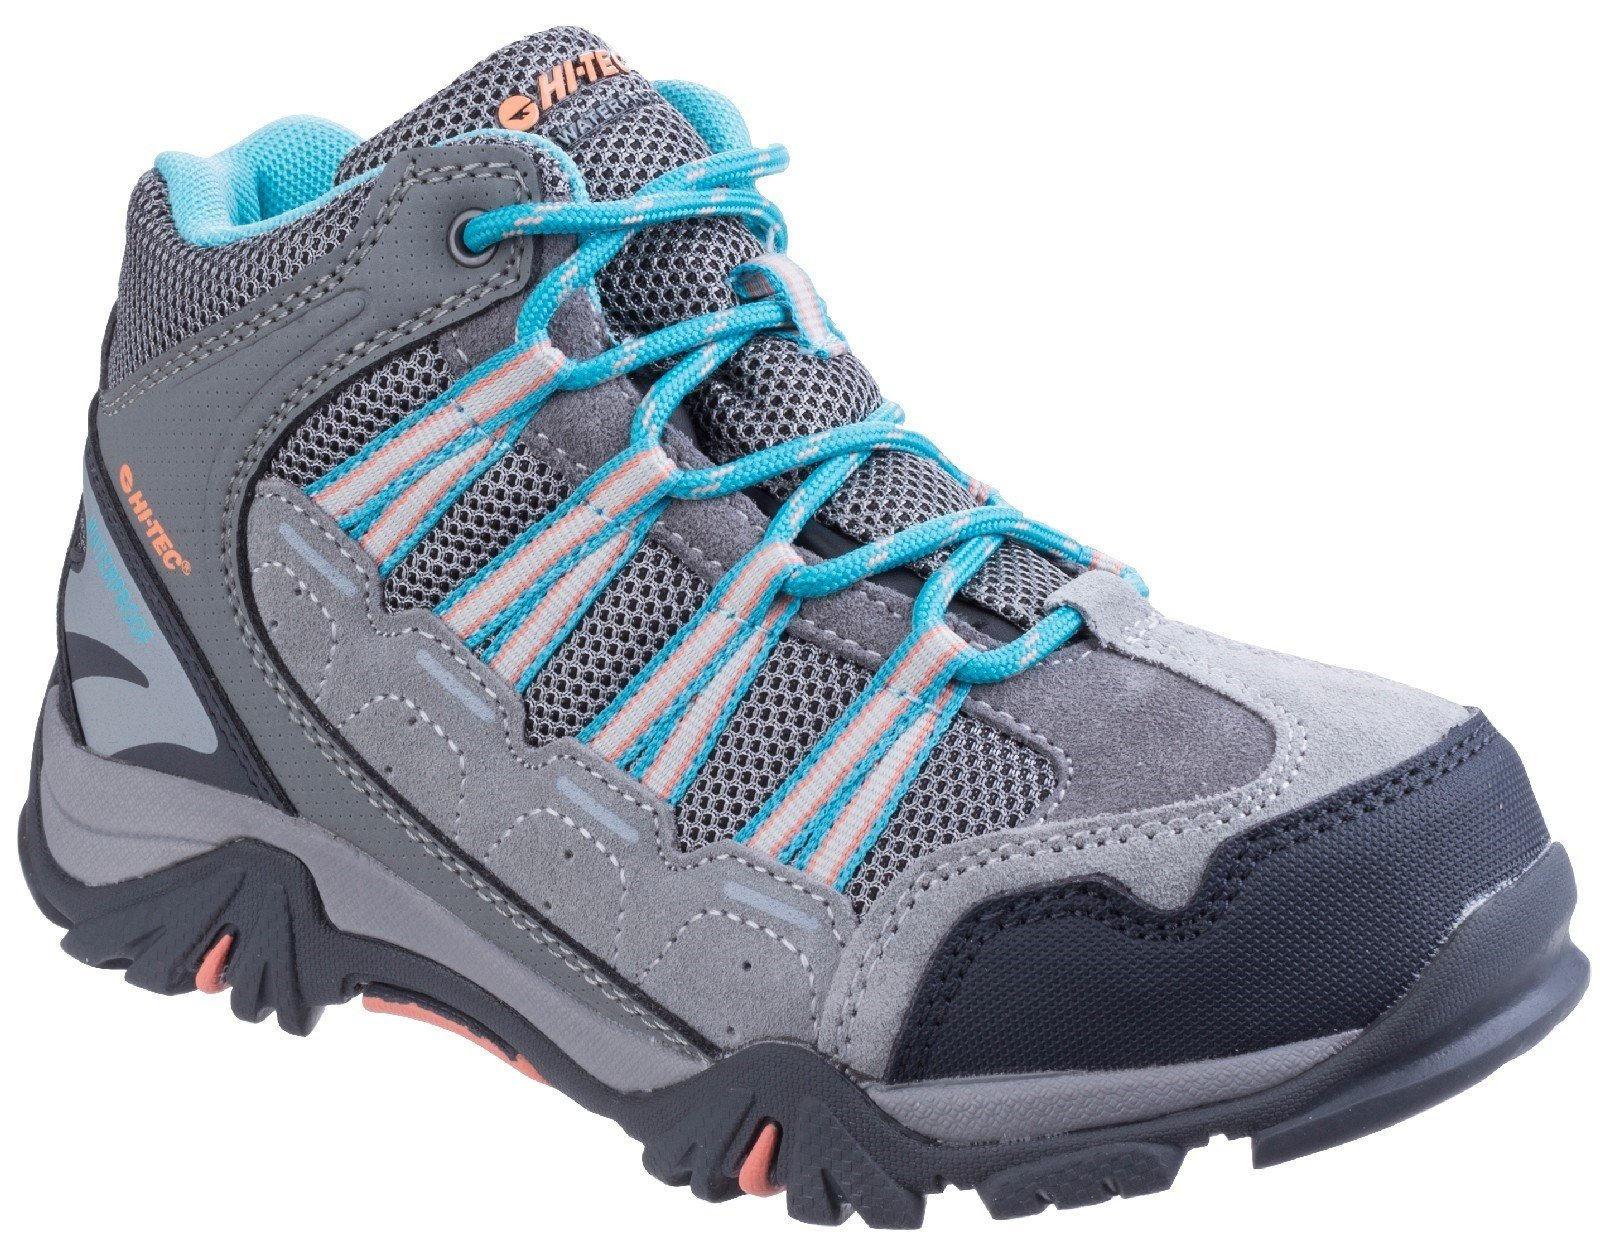 Hi-Tec Unisex Forza Mid Waterproof Hiking Boot Various Colours 25488 - Cool Grey/Blue/Papaya Punch 10